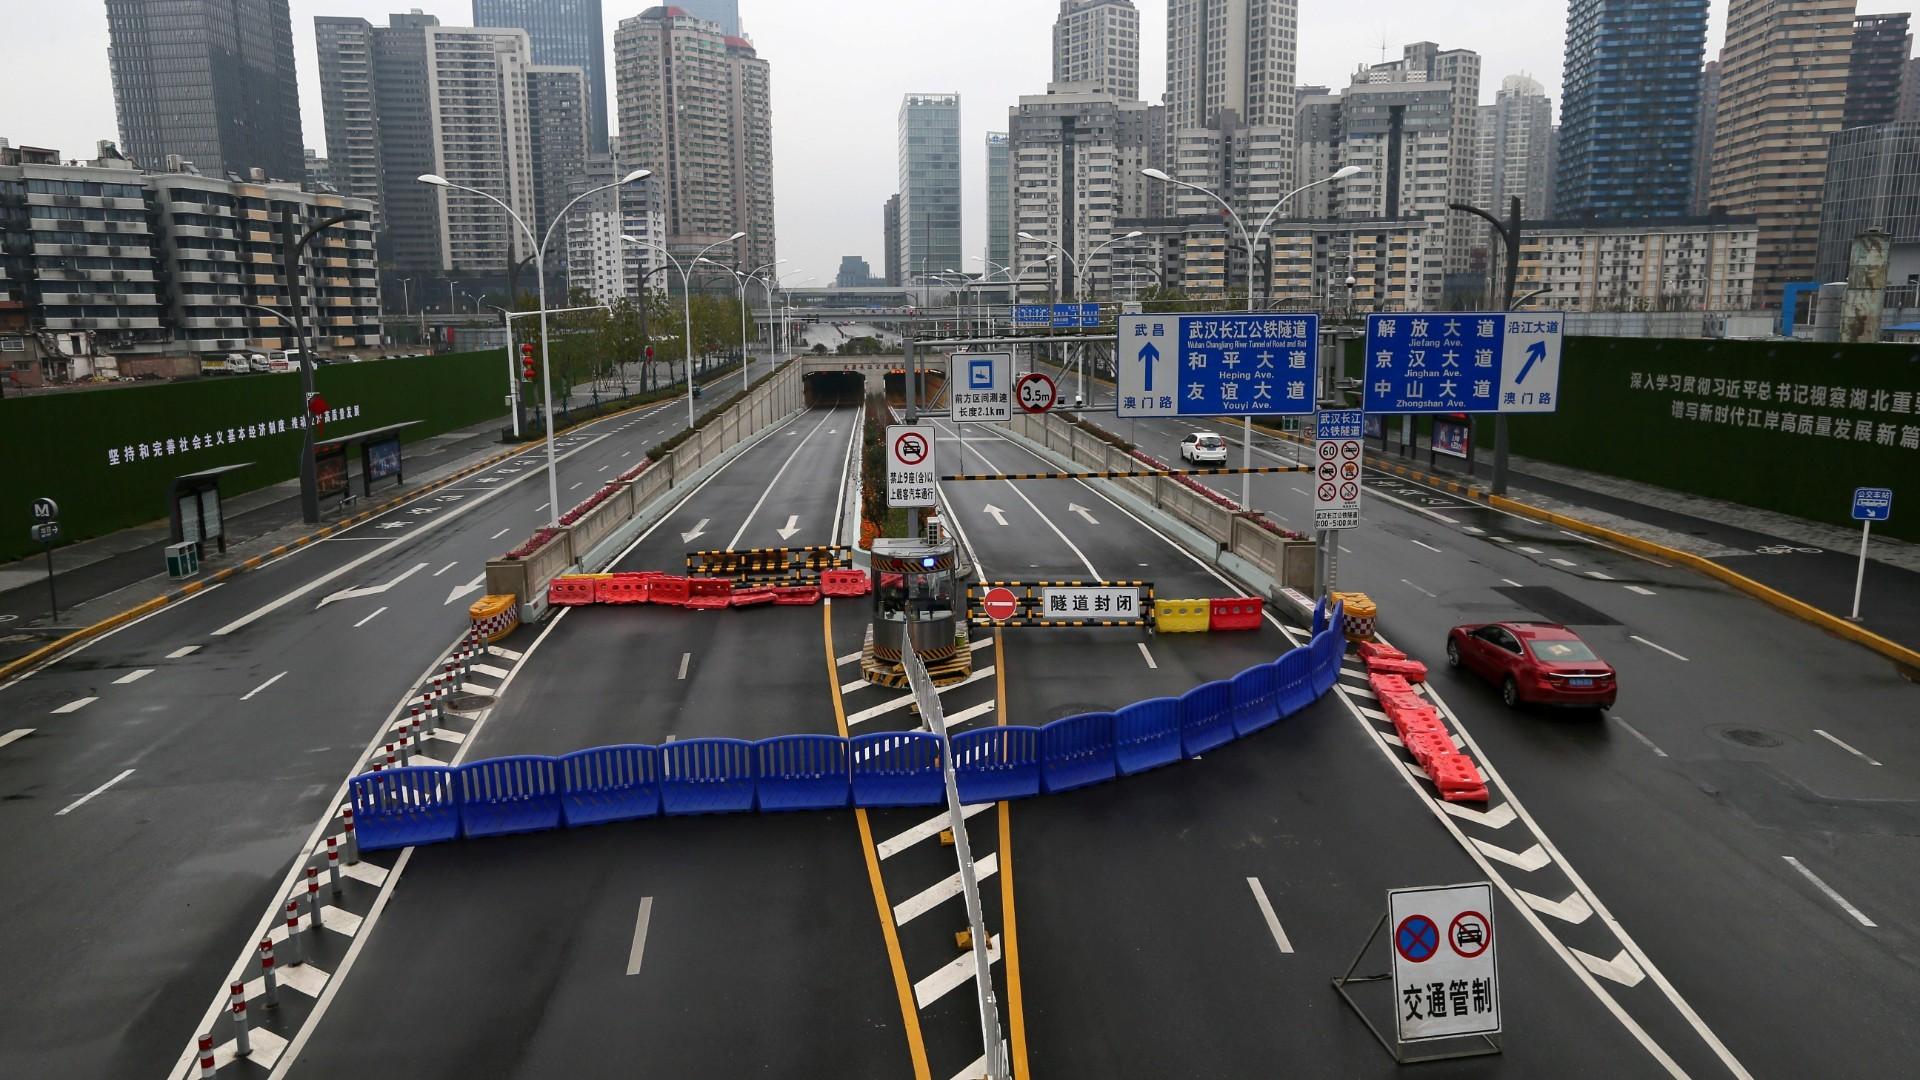 Coronavirus epidemic: Wuhan residents ordered to remain indoors